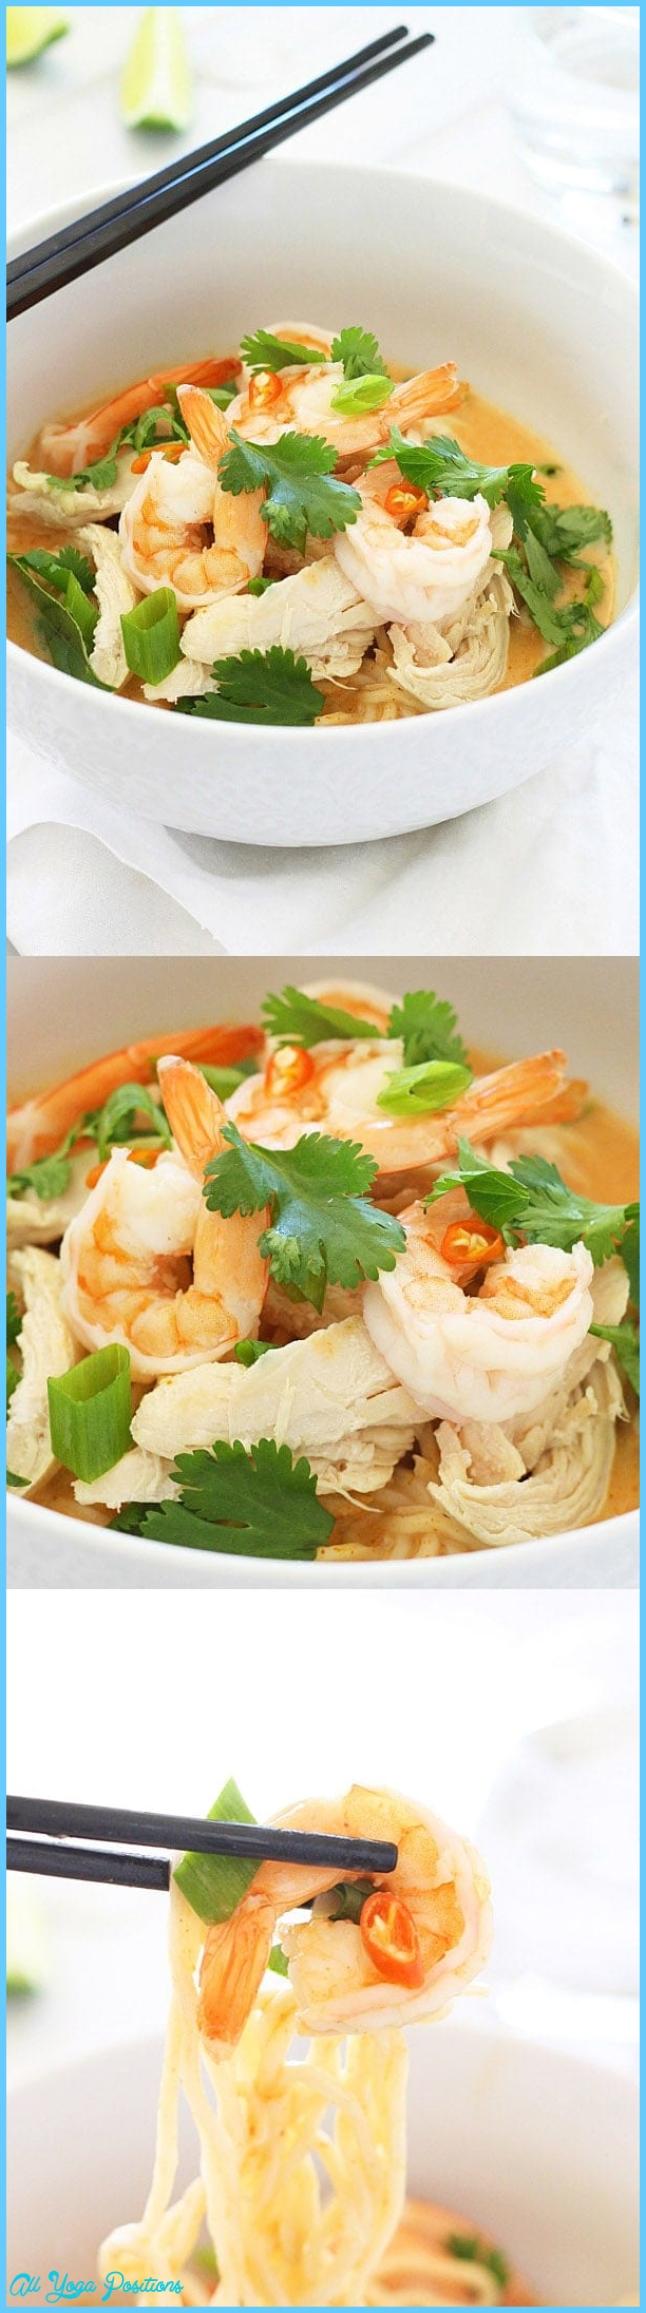 Coconut Curry Noodle Bowl   Easy Delicious Recipes